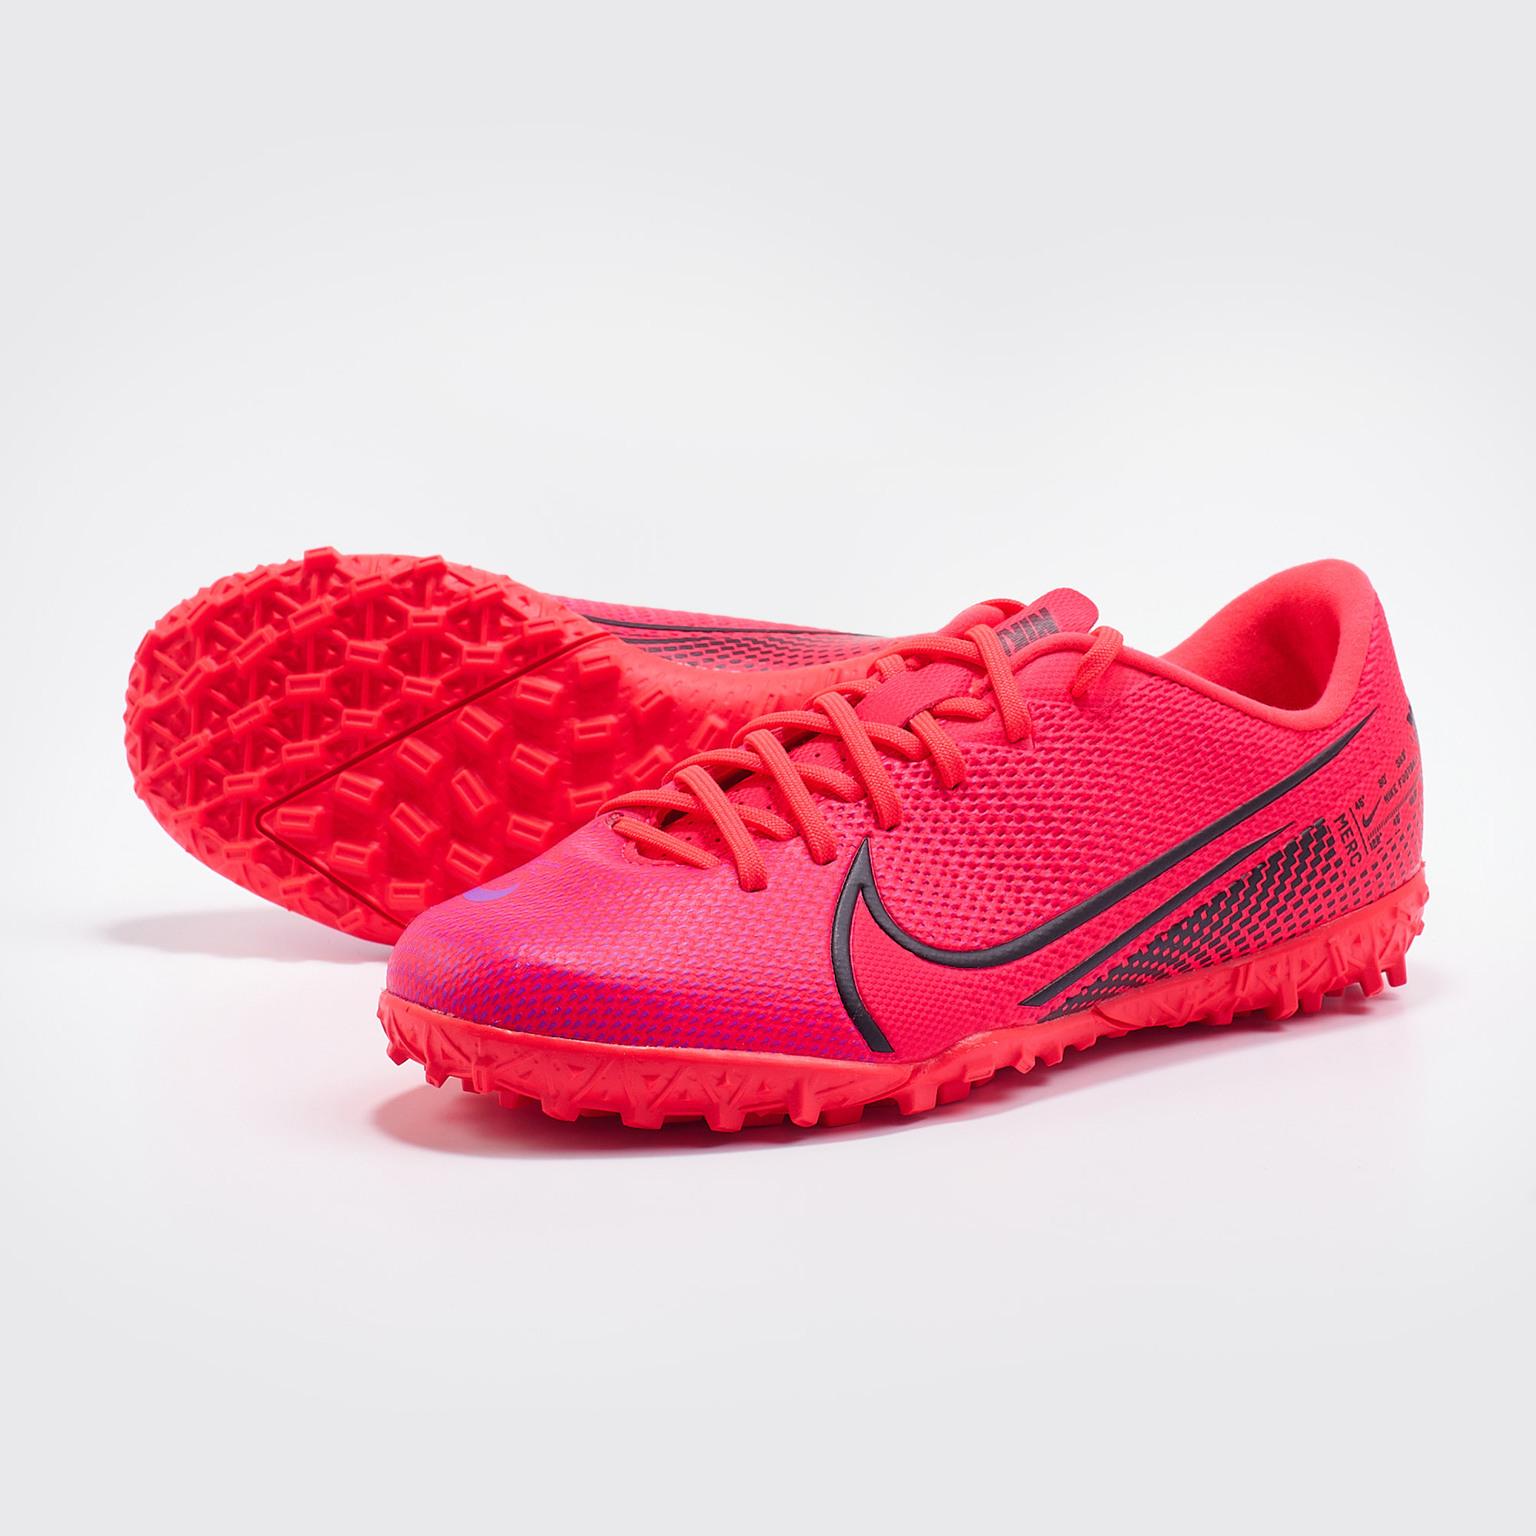 Фото - Шиповки детские Nike Vapor 13 Academy TF AT8145-606 шиповки детские nike vapor 13 academy neymar tf at8144 104